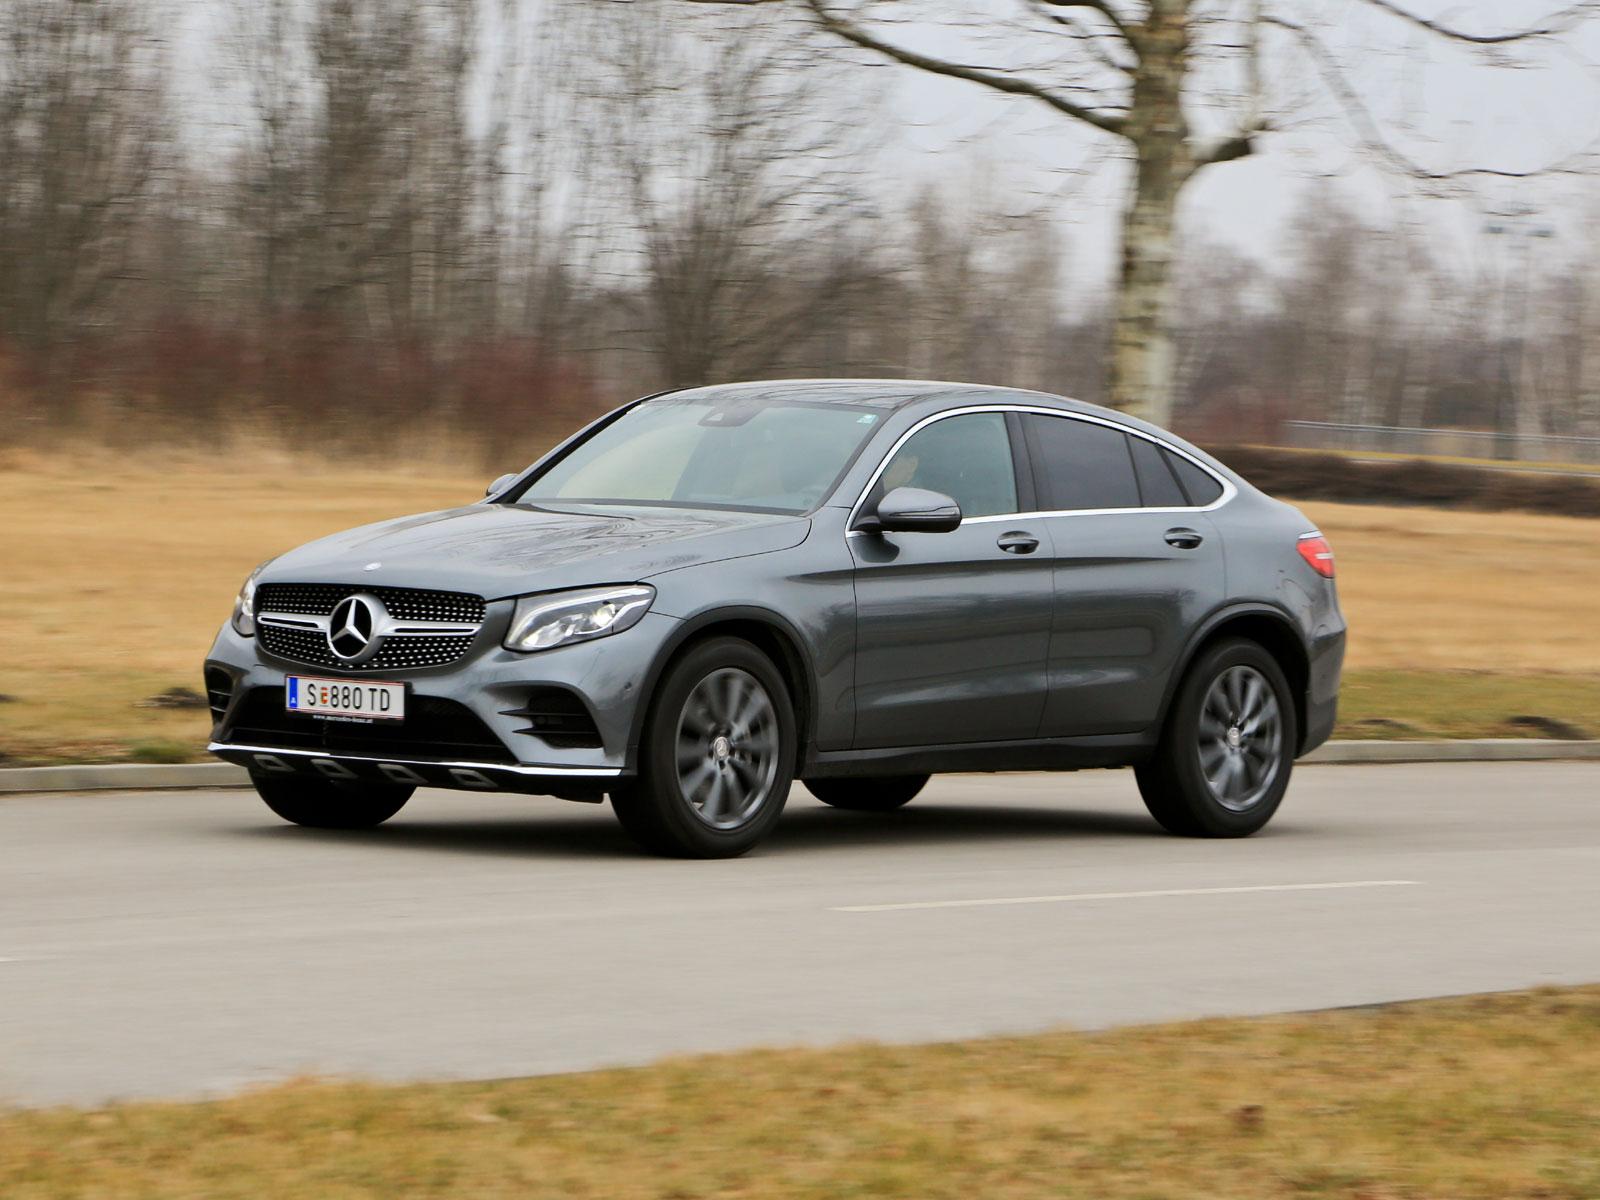 Mercedes Glc 220 D 4matic Coup 233 Testbericht Autoguru At